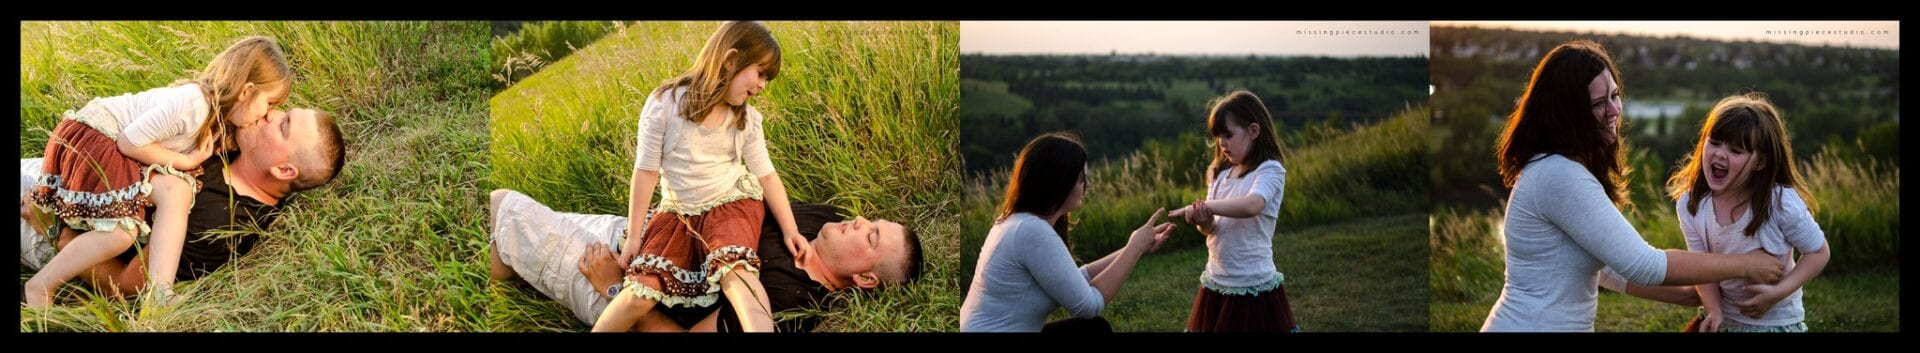 Edmonton Family Portrait Photography Candid-collage014